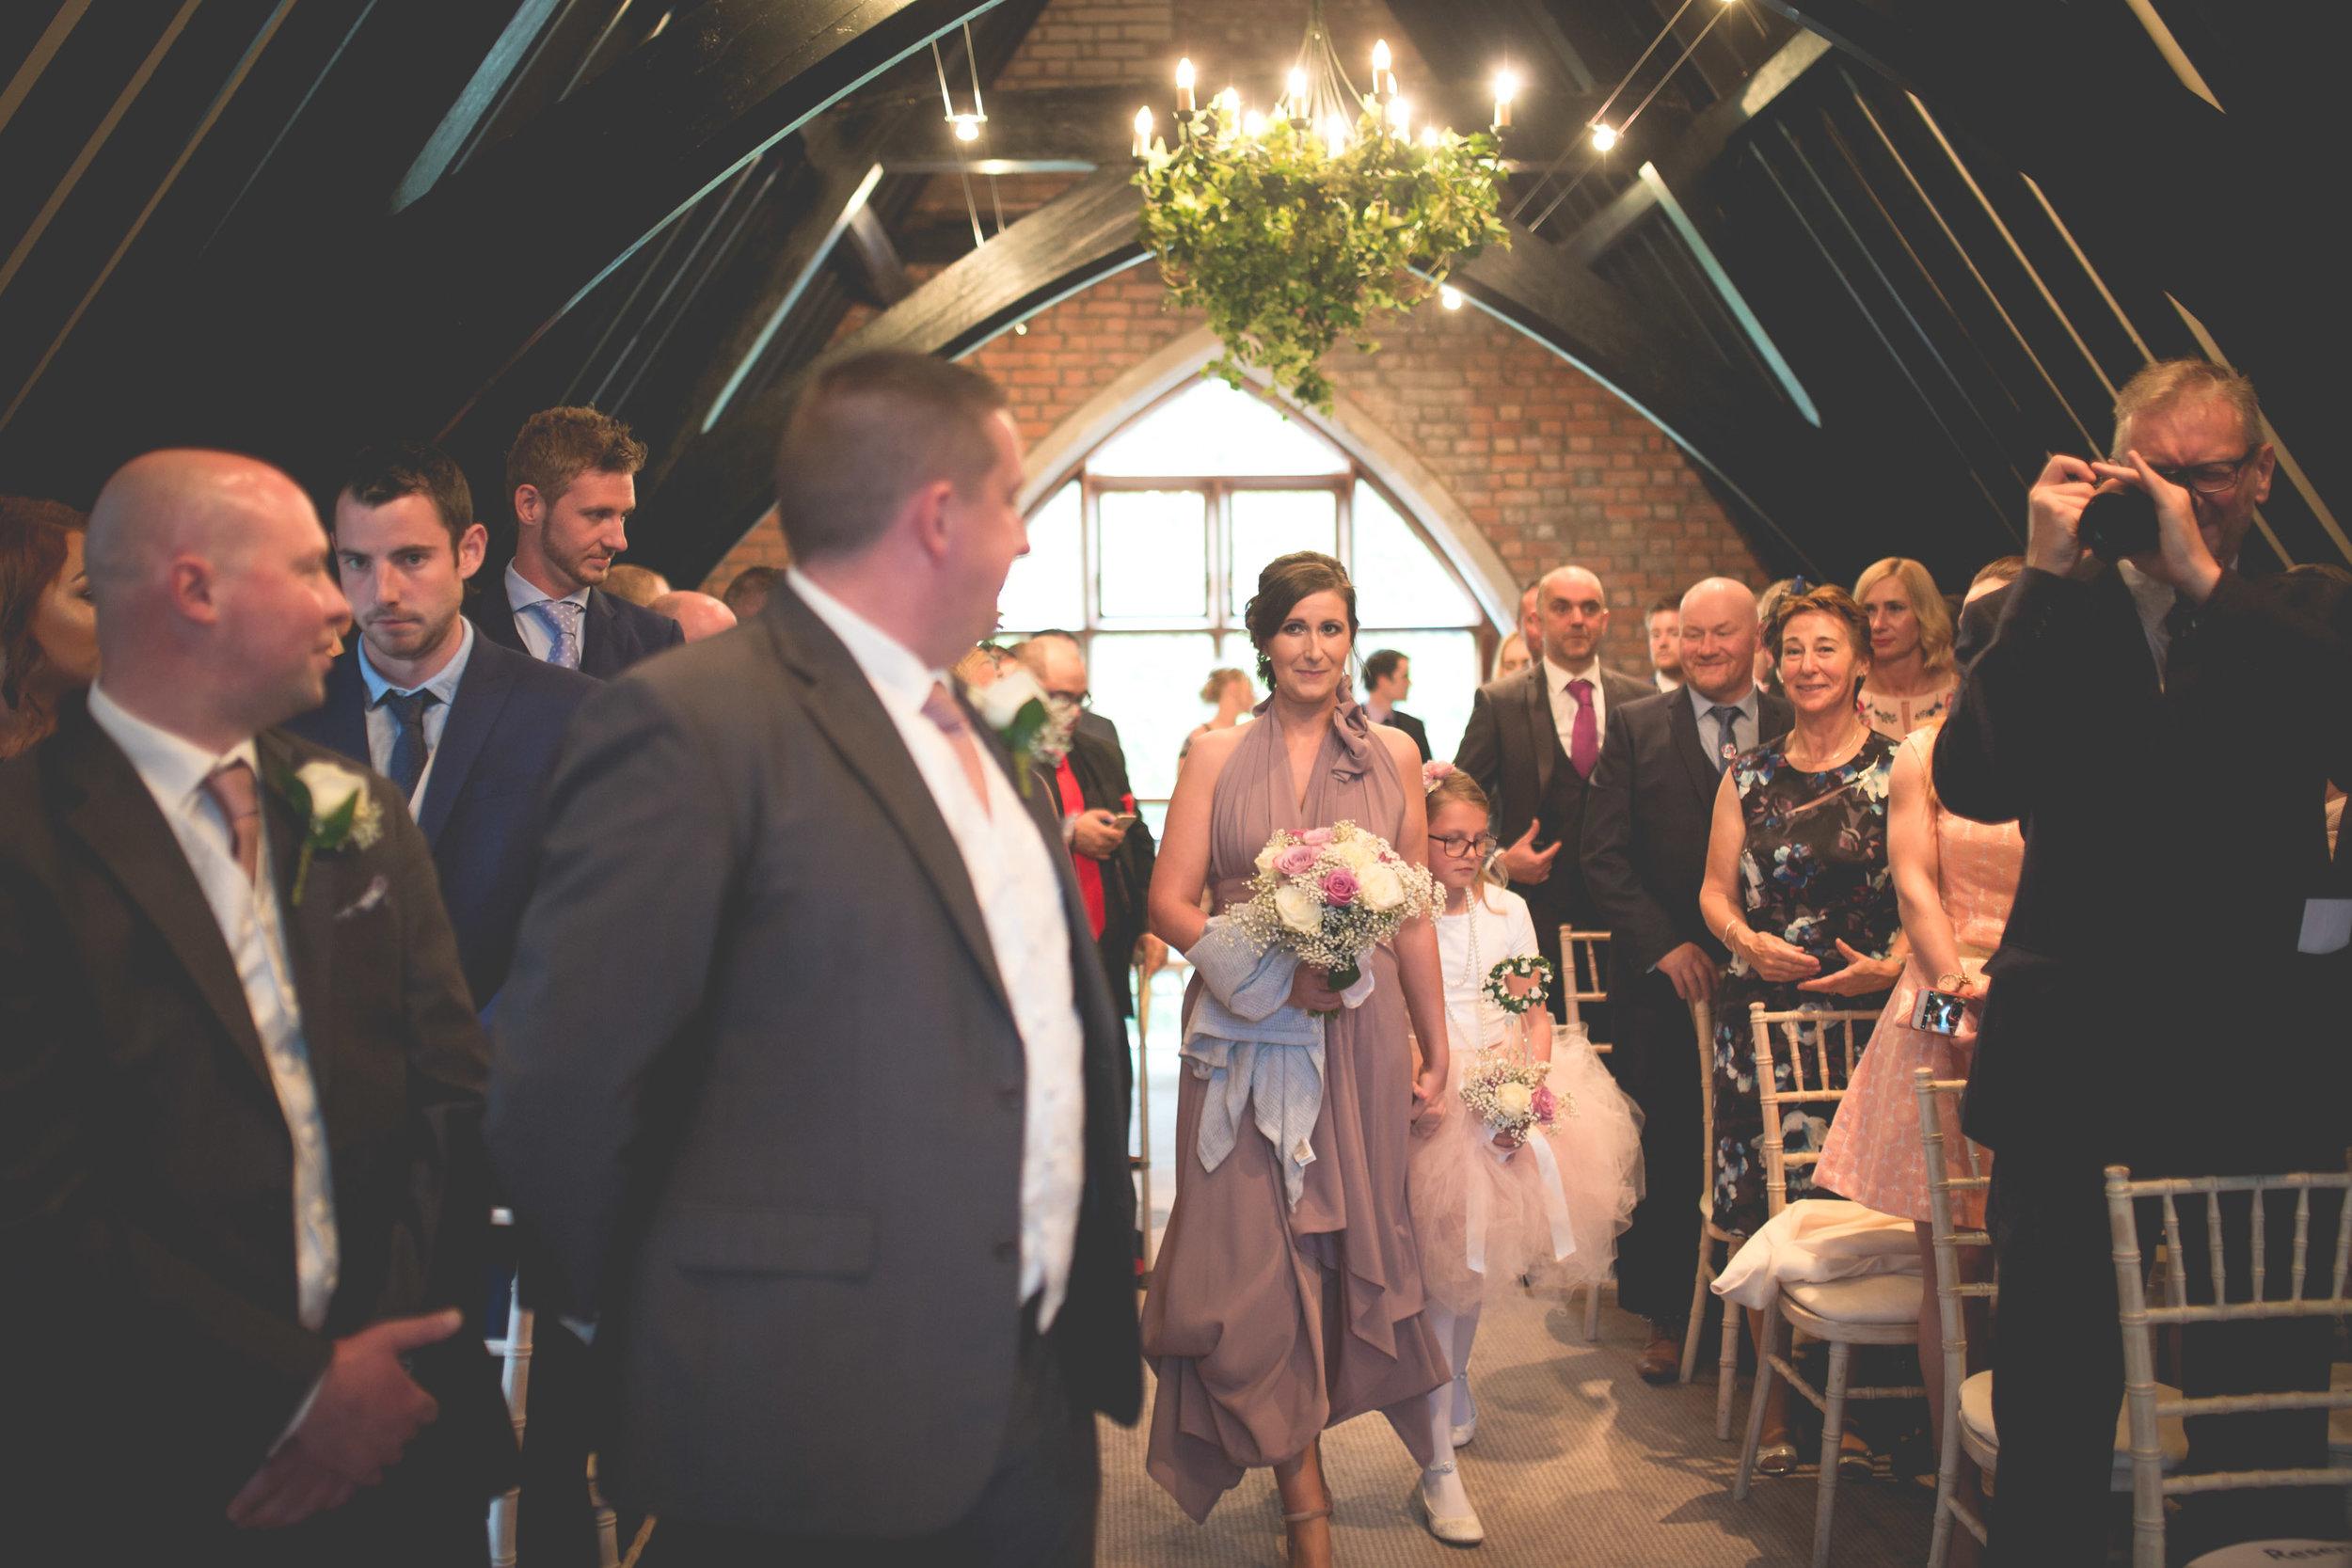 Helena & Terence - Ceremony-11.jpg